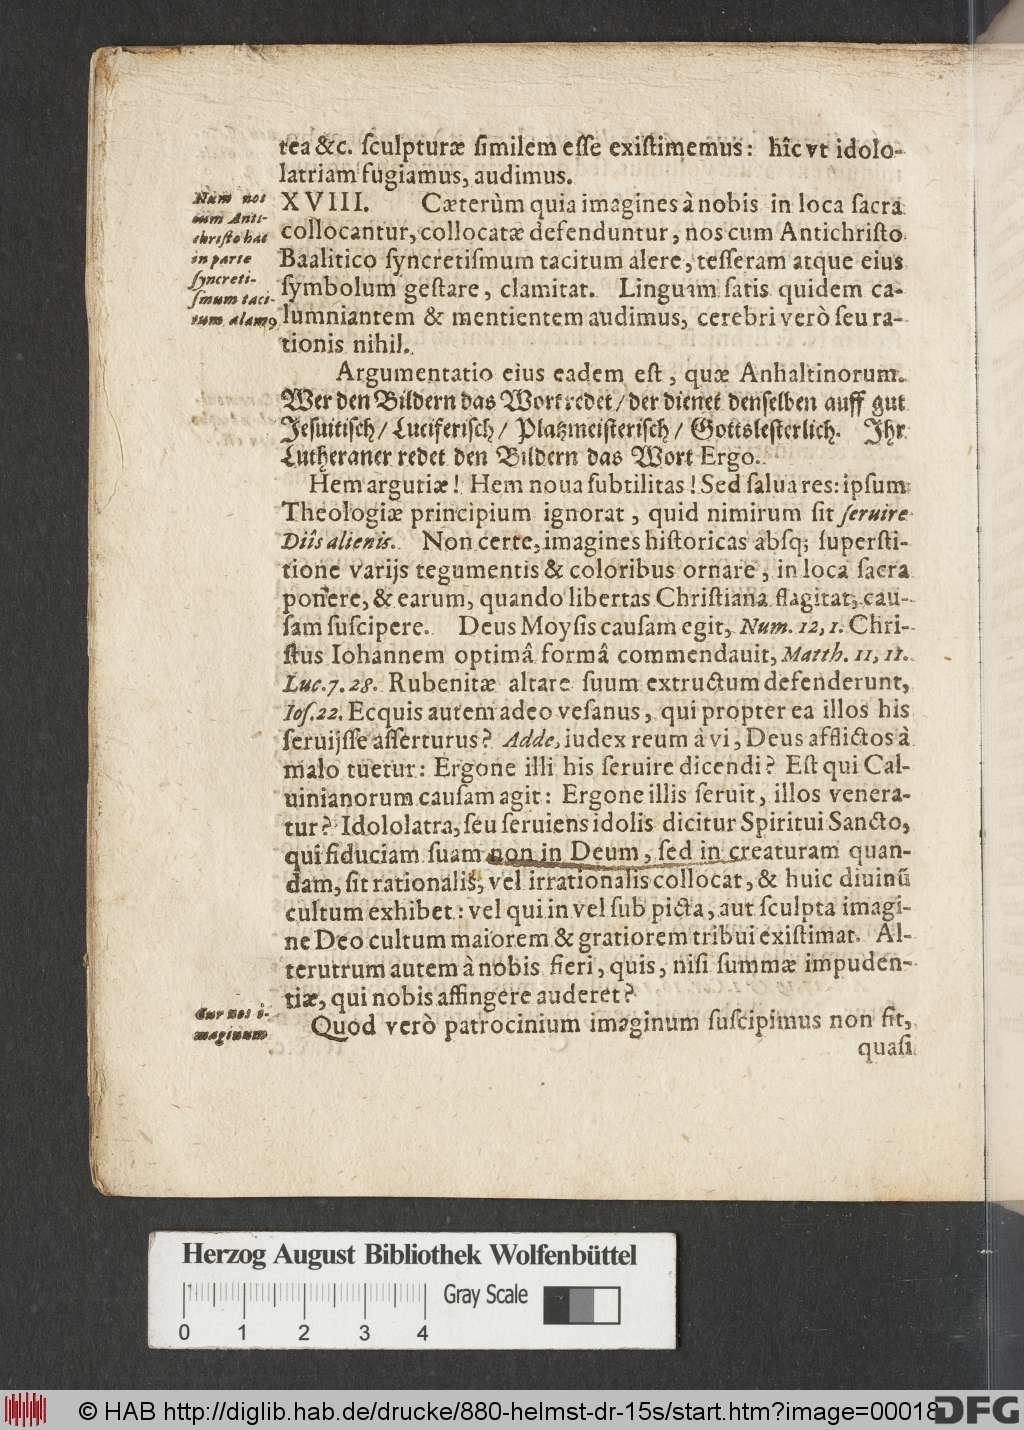 http://diglib.hab.de/drucke/880-helmst-dr-15s/00018.jpg